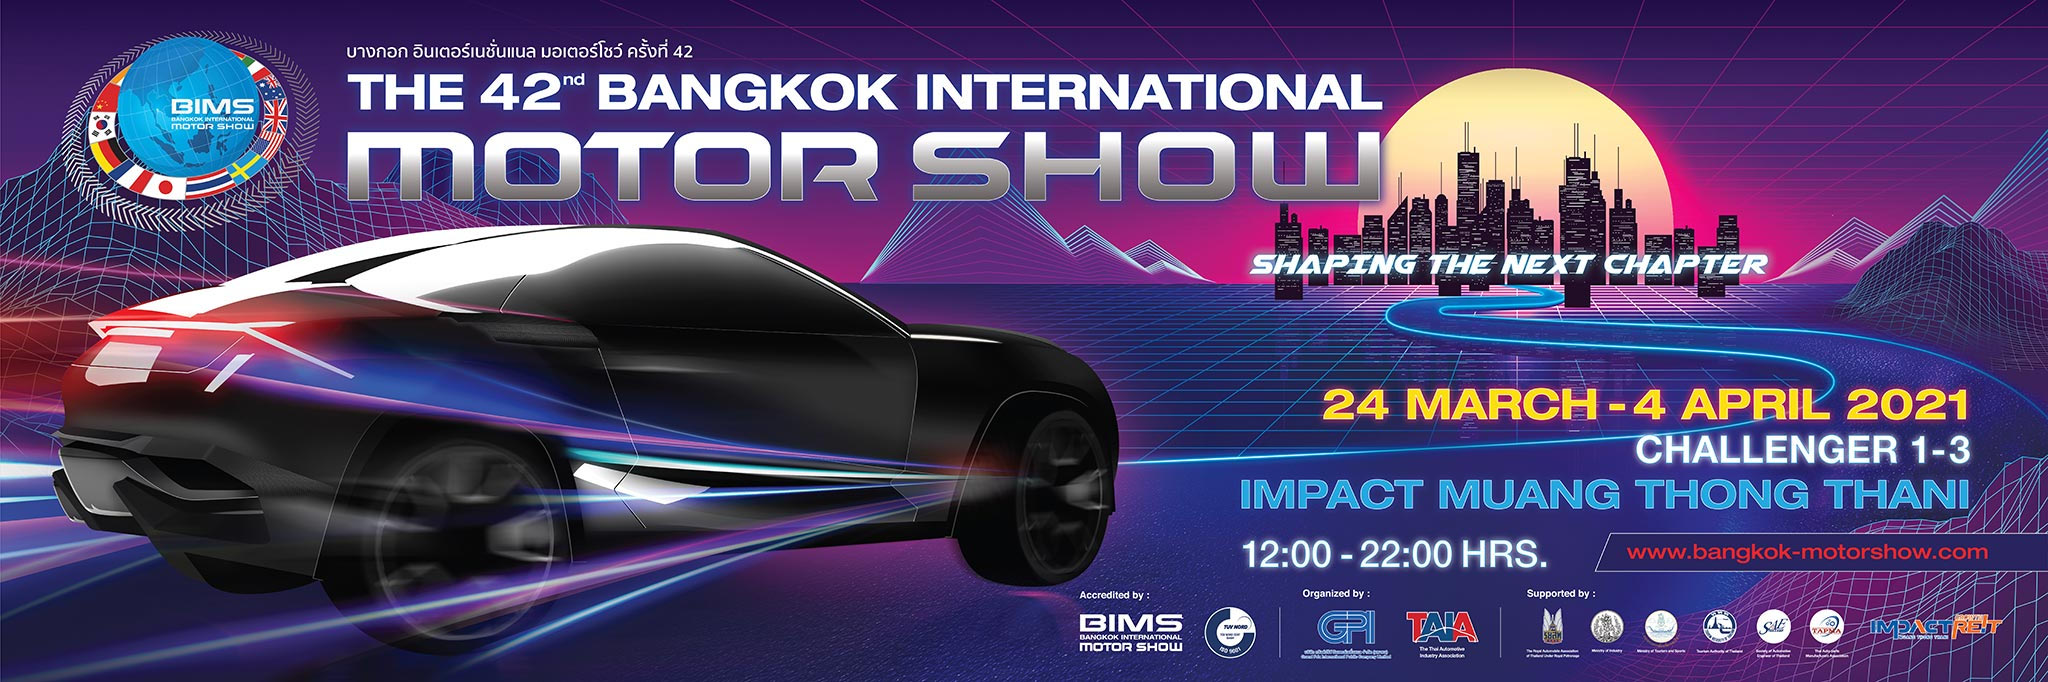 Bangkok International Motor Show promotional poster